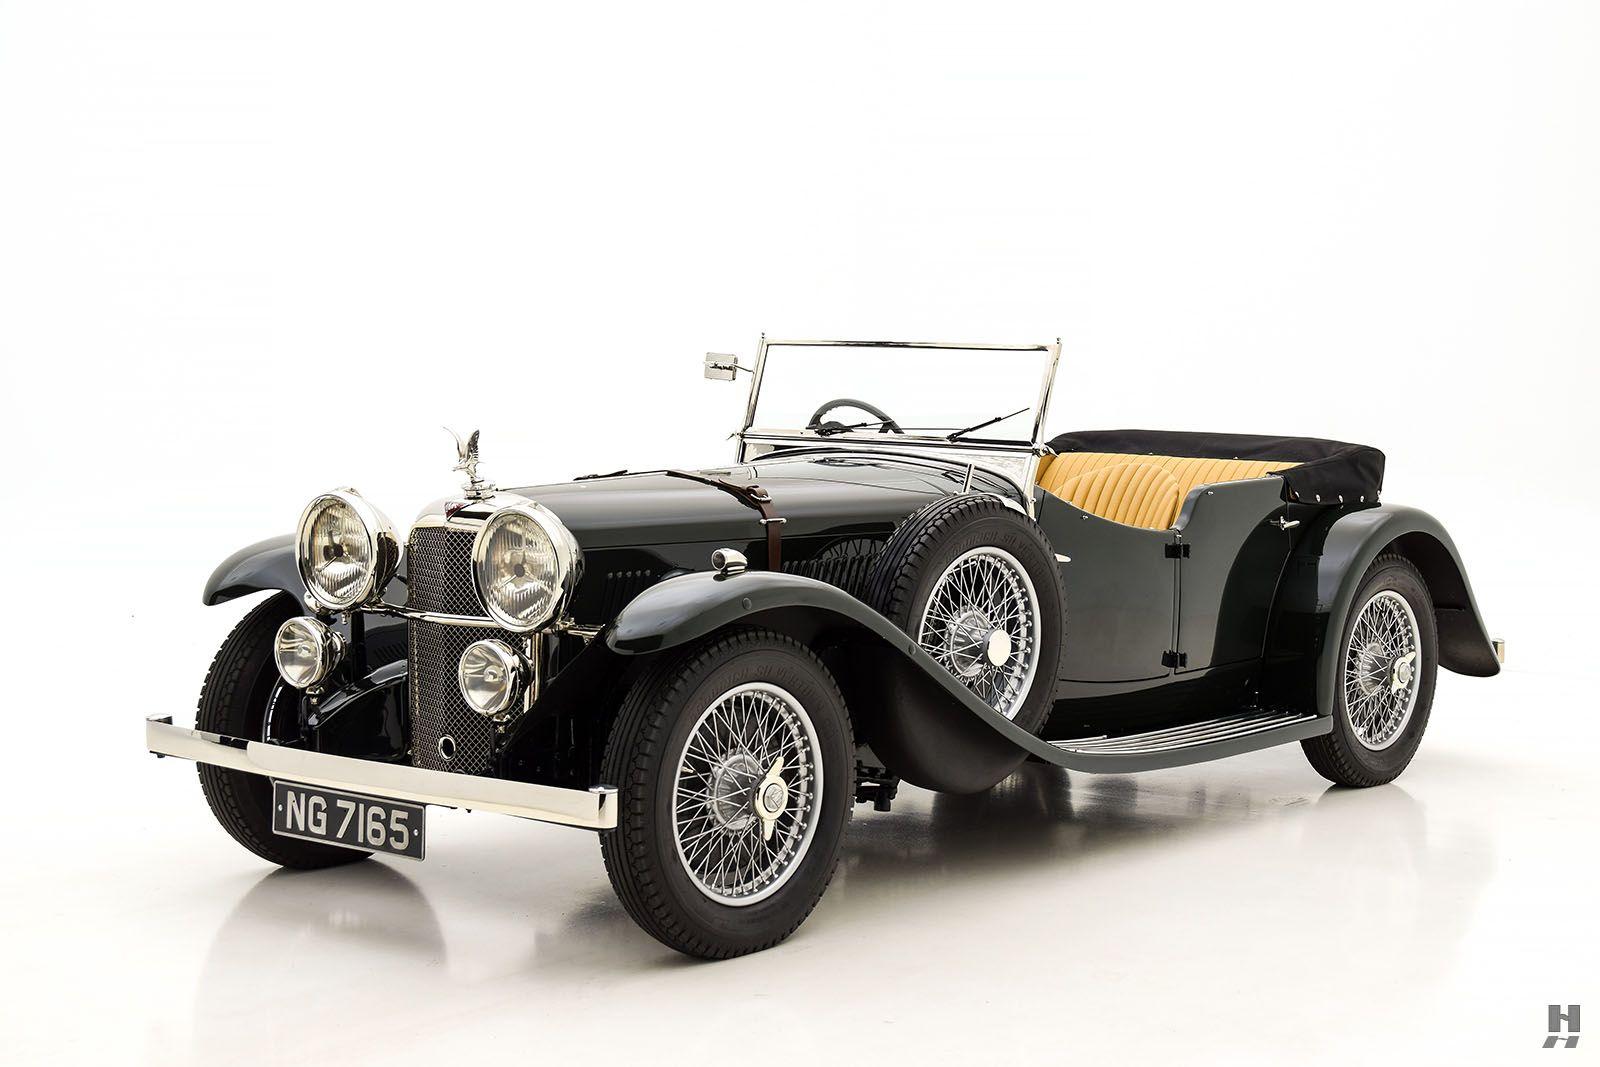 1934 alvis speed 20 sports tourer | antique cars HYMAN LTO ...